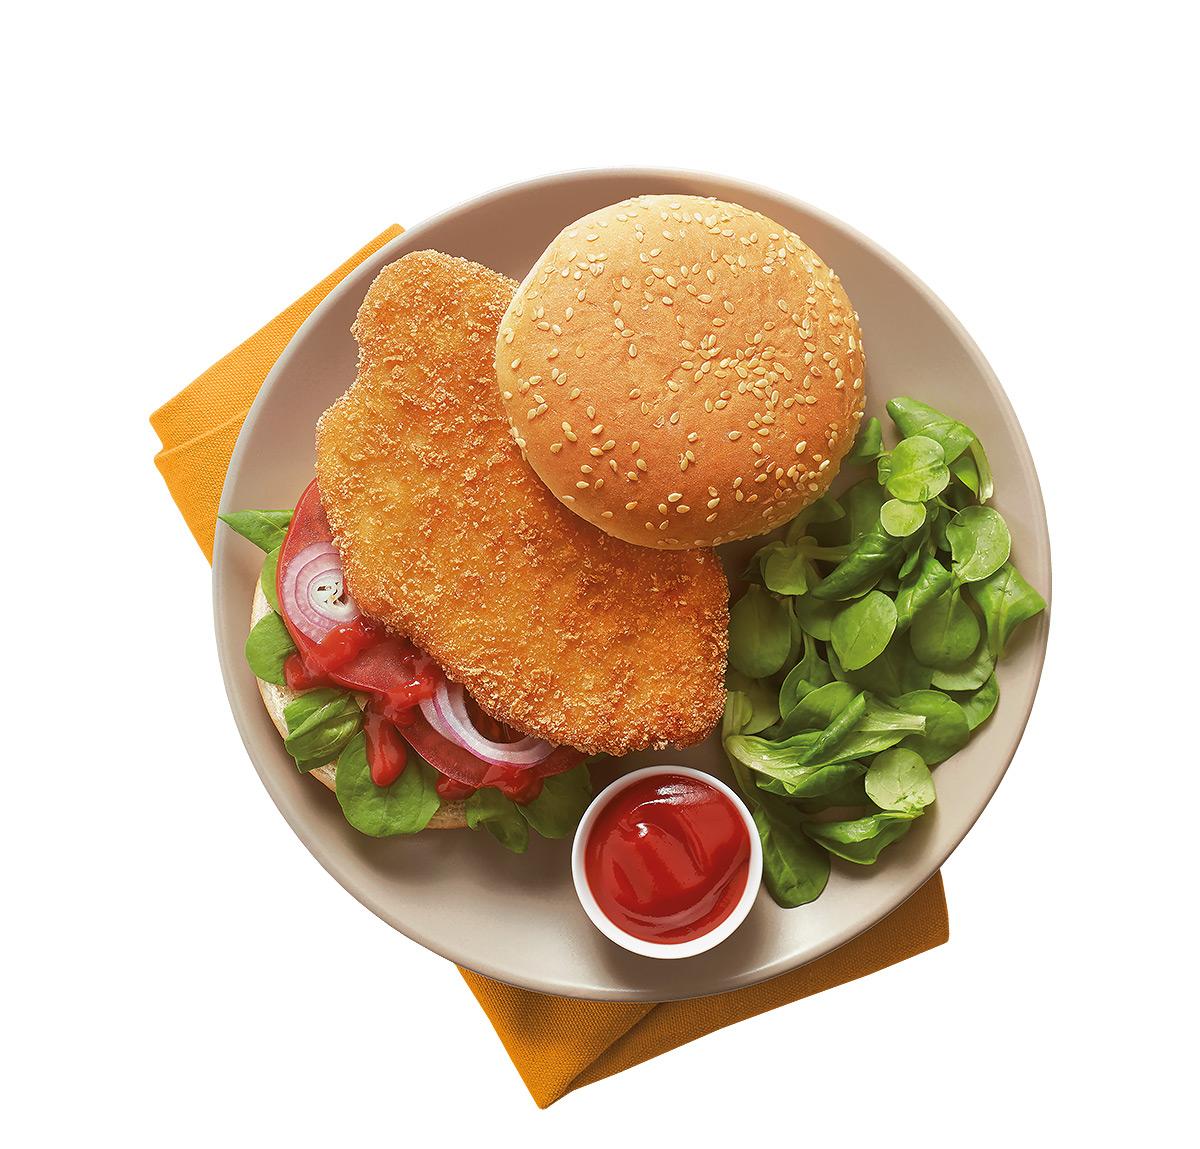 456039 coated chicken cutlet 2kg hr